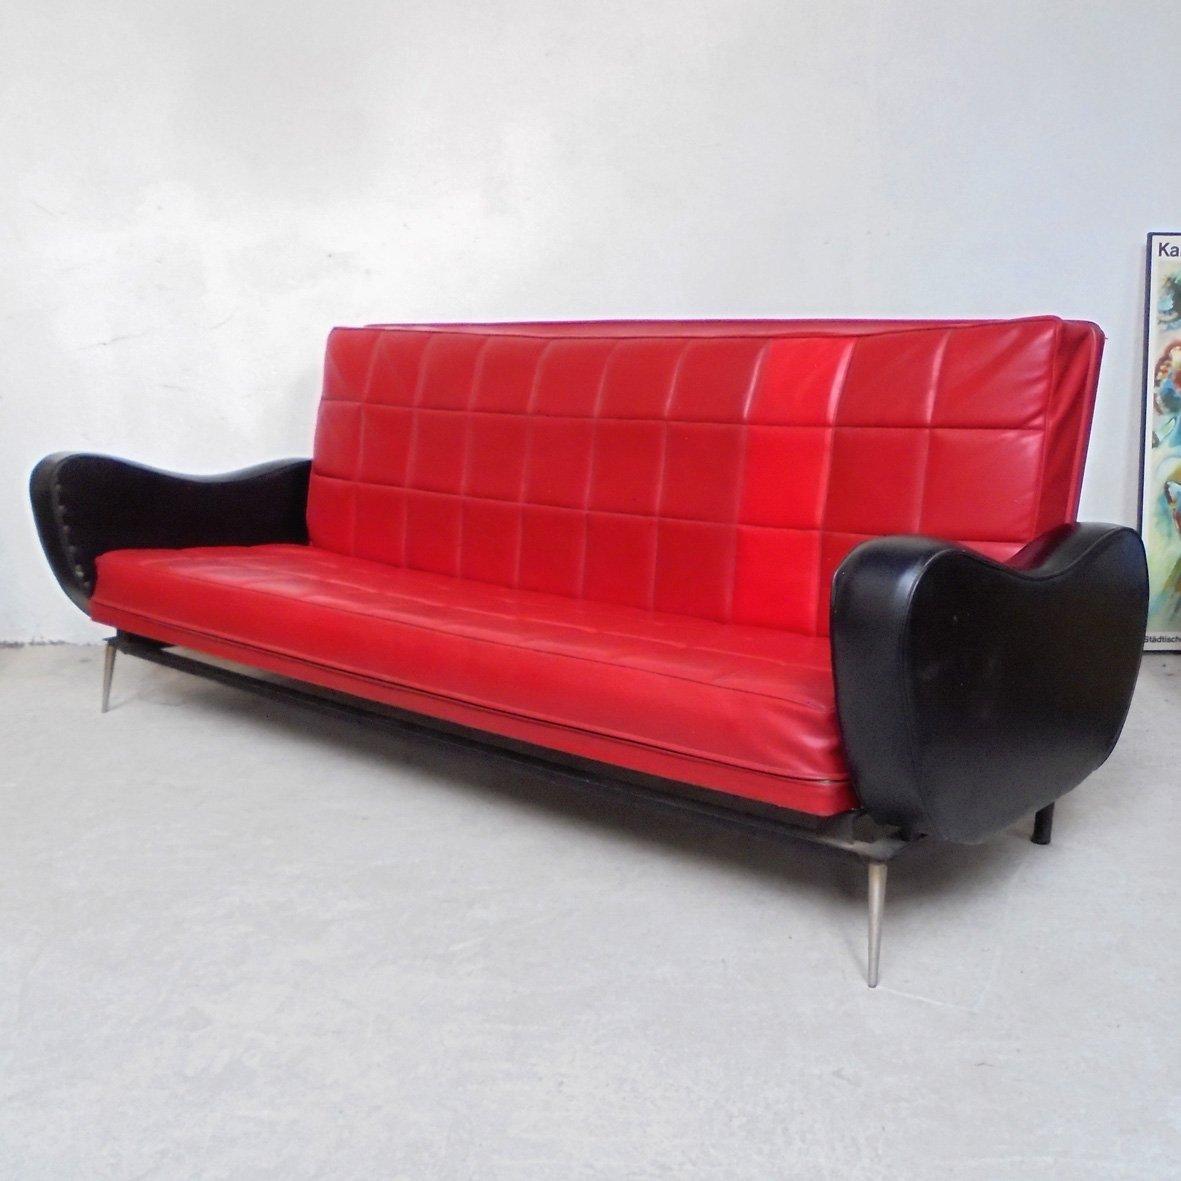 Vintage skai schlafsofa in schwarz rot 1950er bei for Schlafsofa retro